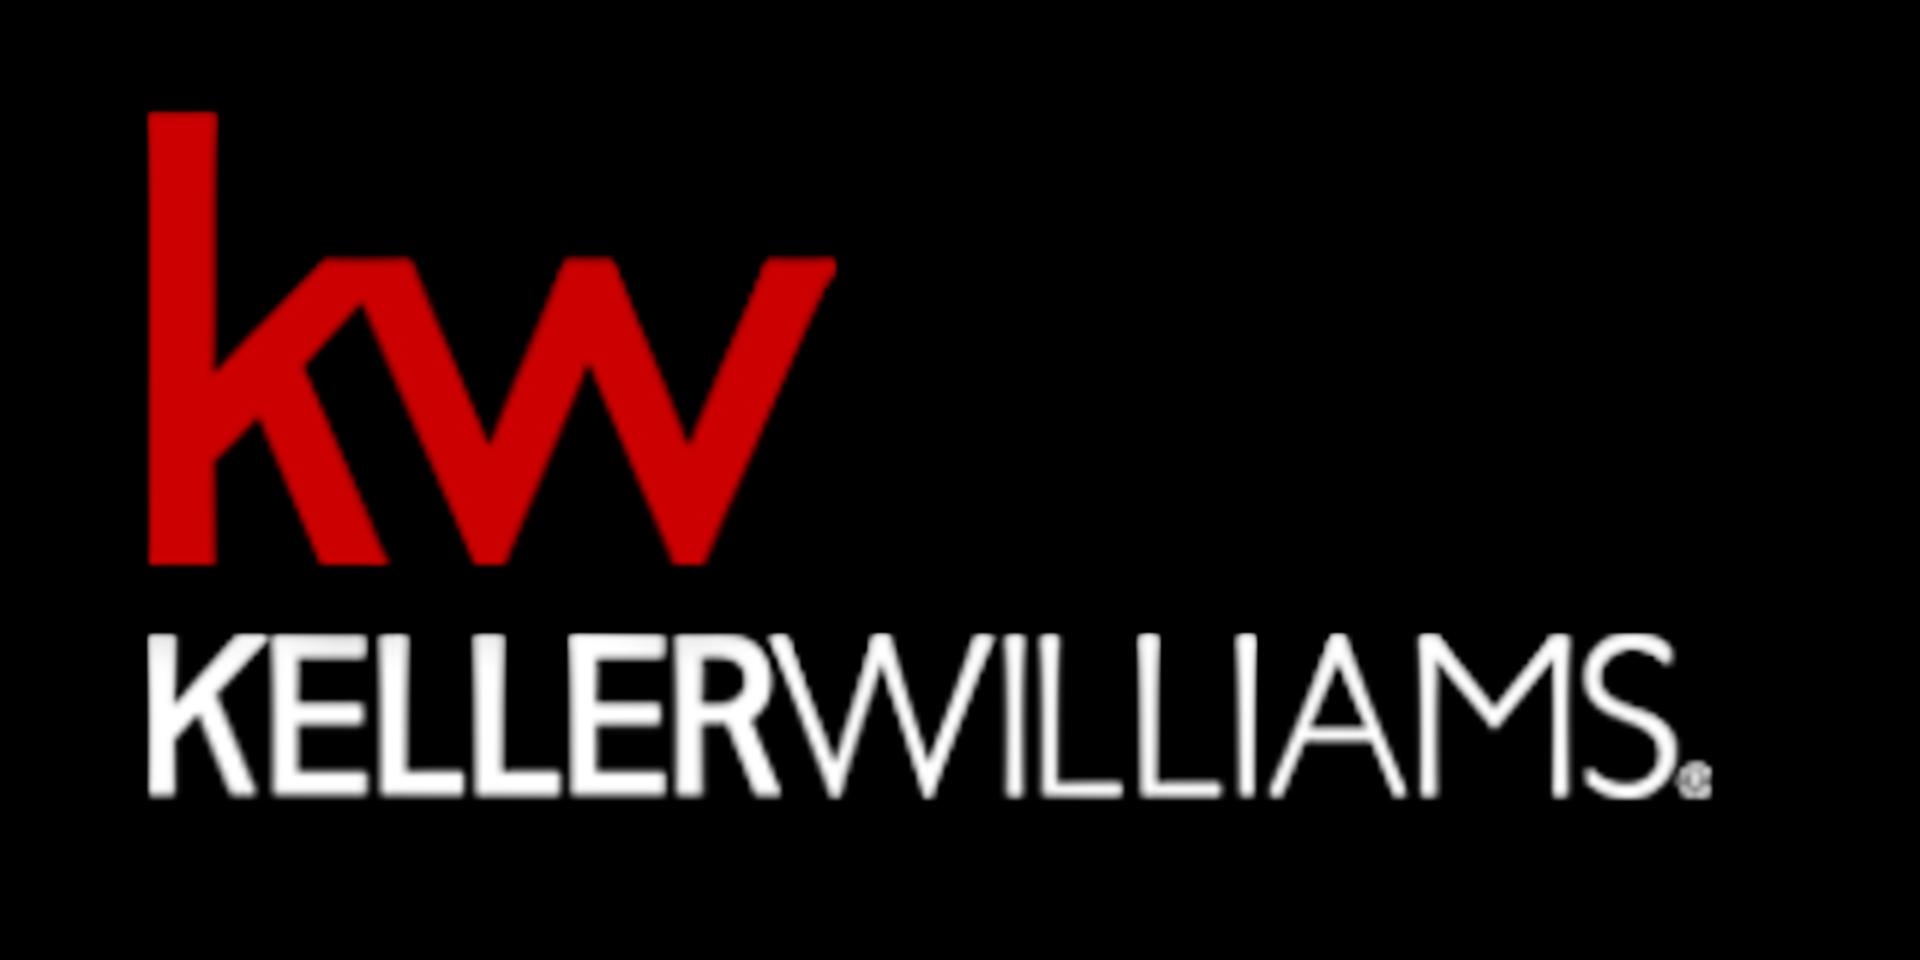 https://www.zillow.com/profile/Cheri-Savini/#reviews